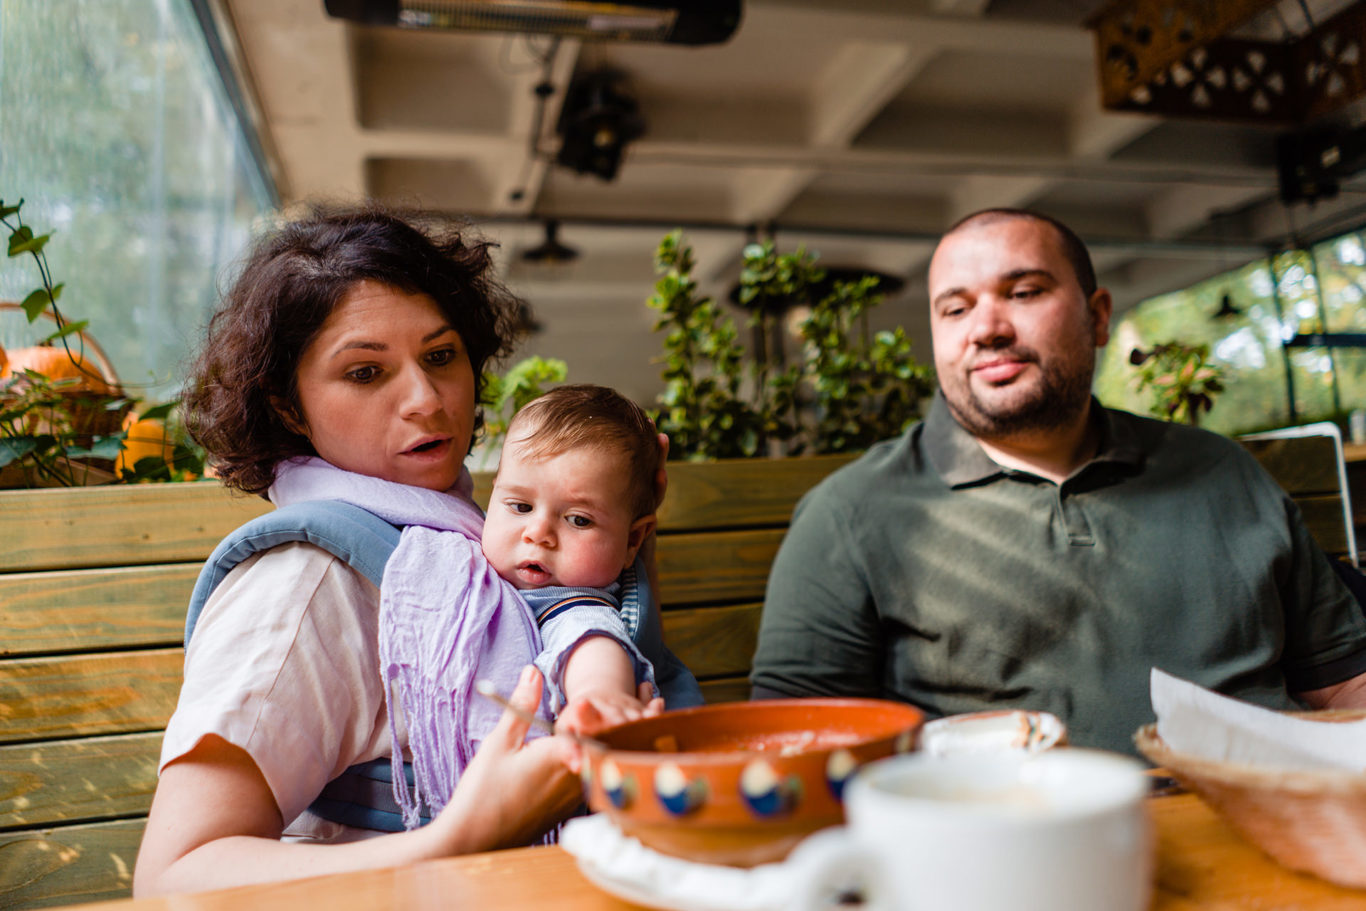 Fotografii de familie in culori de toamna - fotograf de familie - Ciprian Dumitrescu - fotograf Bucuresti - fotografie copii